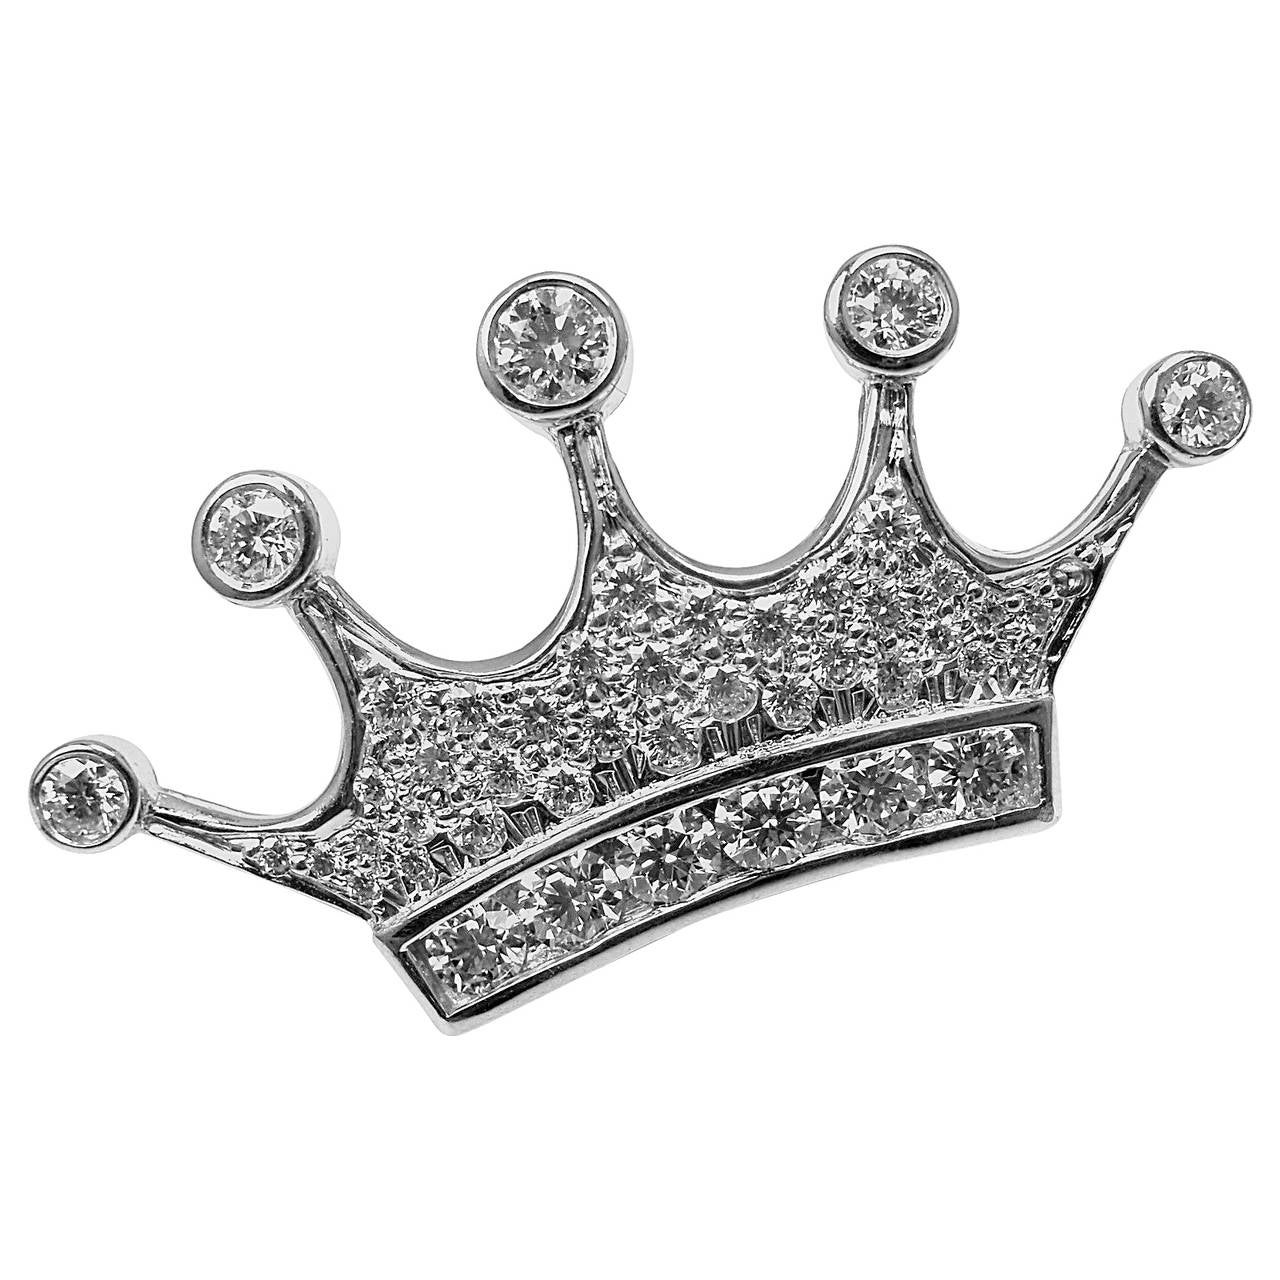 Tiffany & Co. Crown Diamond Platinum Brooch